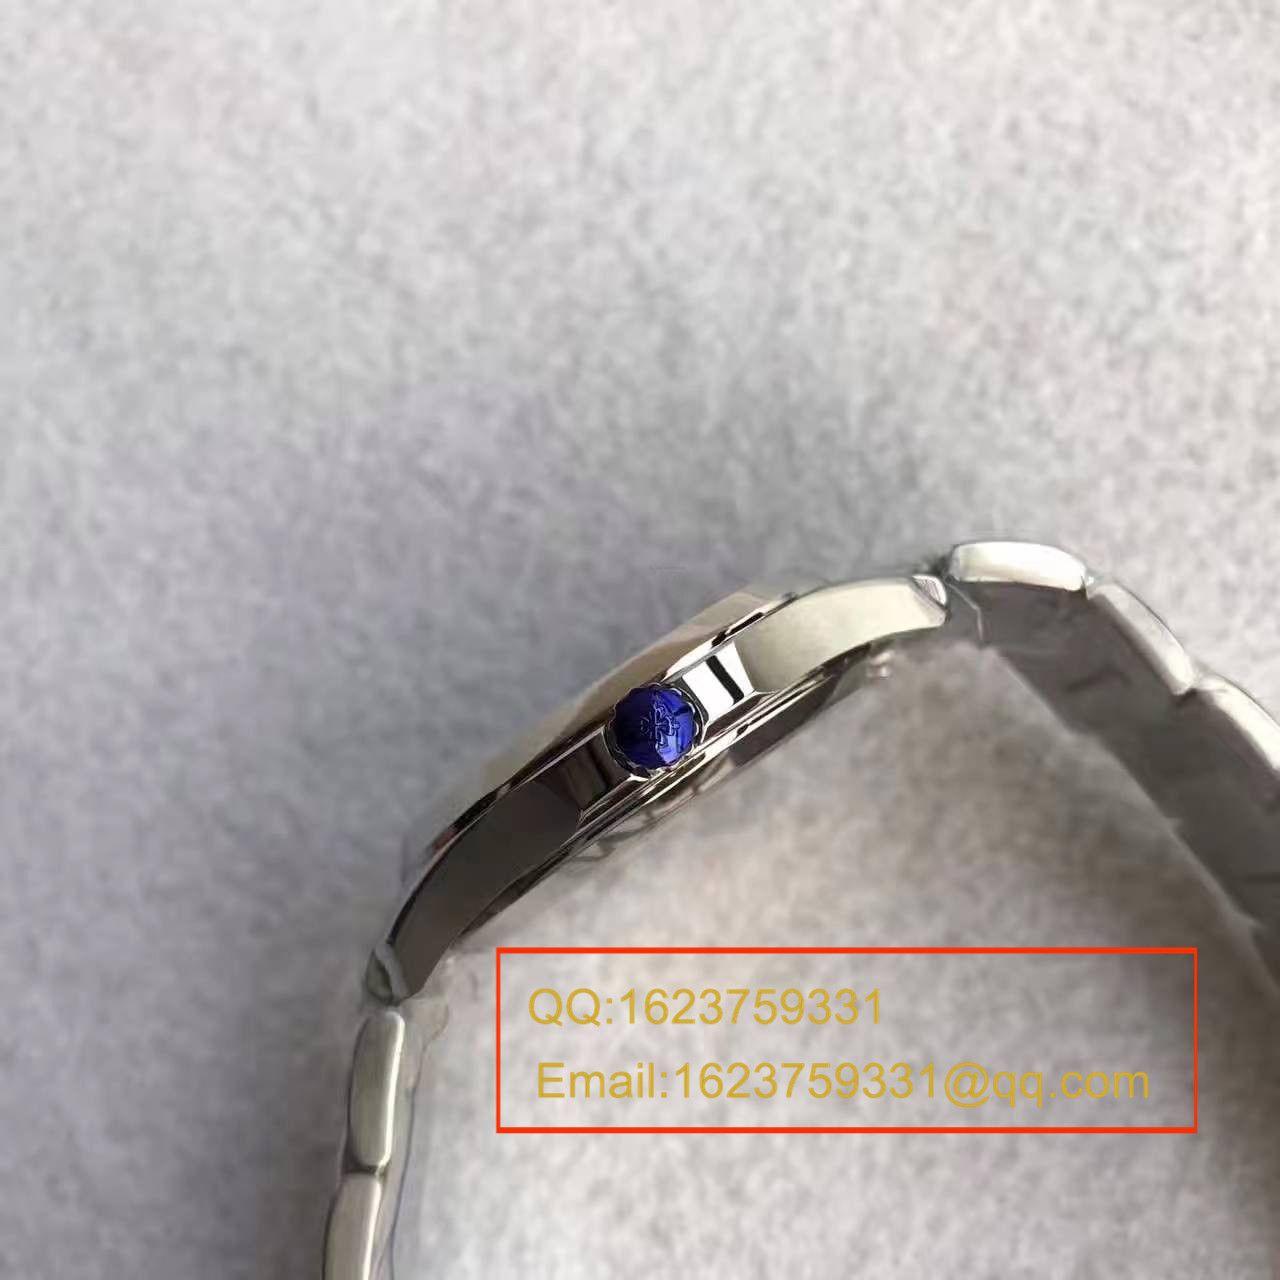 【BP顶级1:1复刻手表】百达翡丽AQUANAUT系列5167/1A-001腕表《百达翡丽手雷》 / BD127